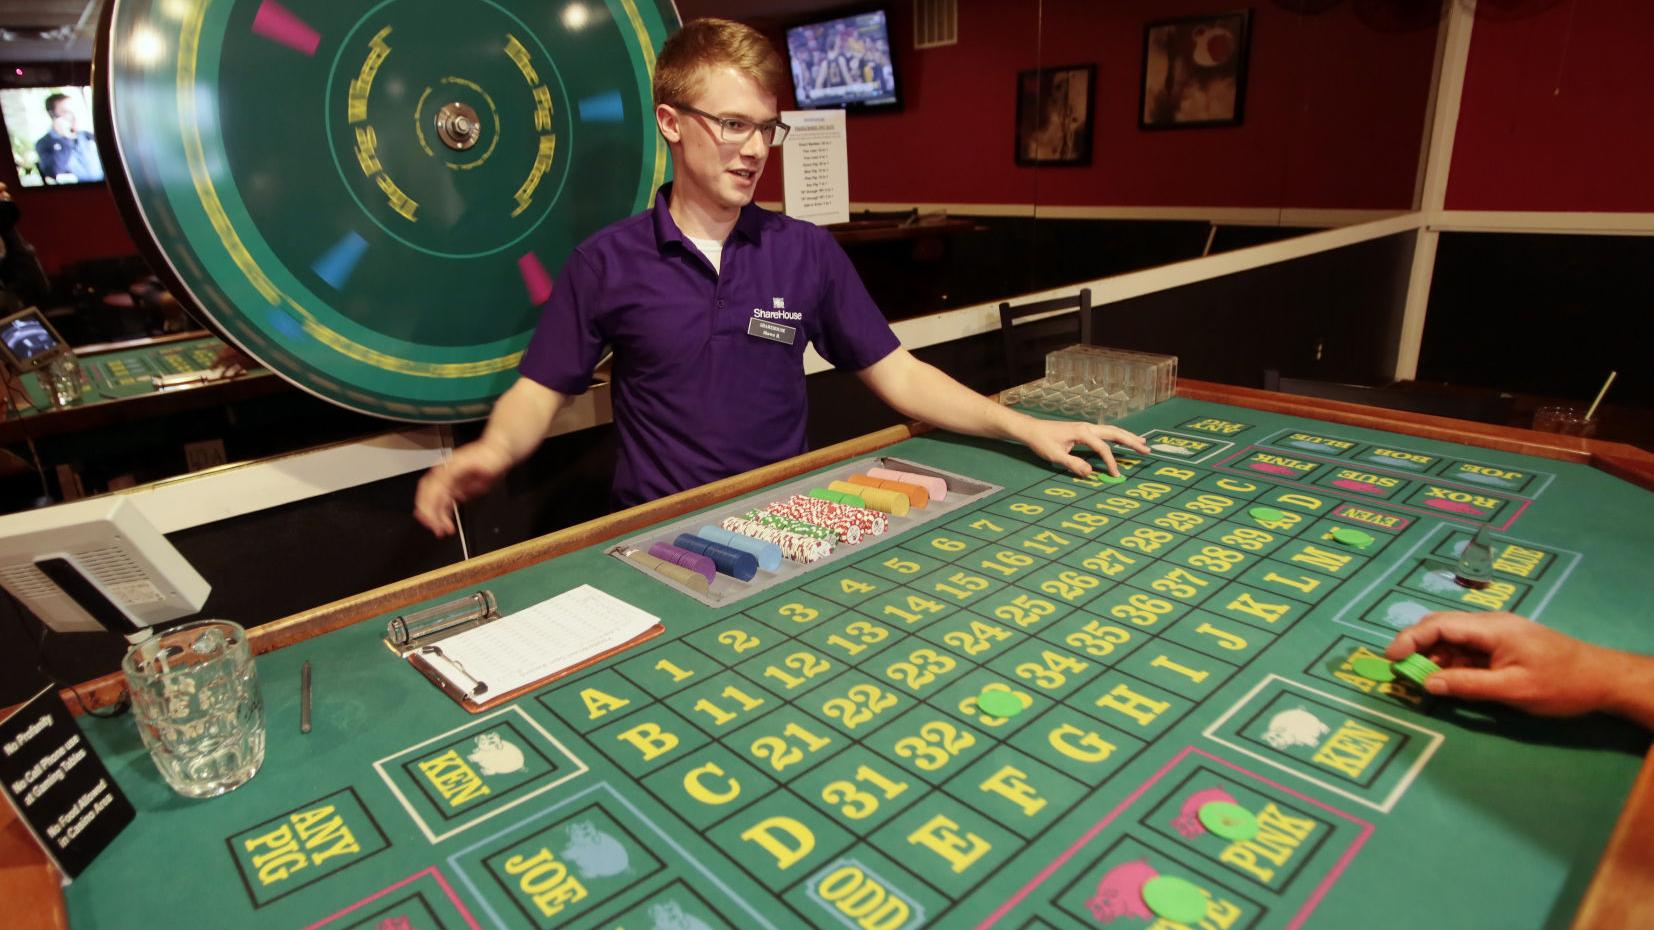 South dakota gambling help